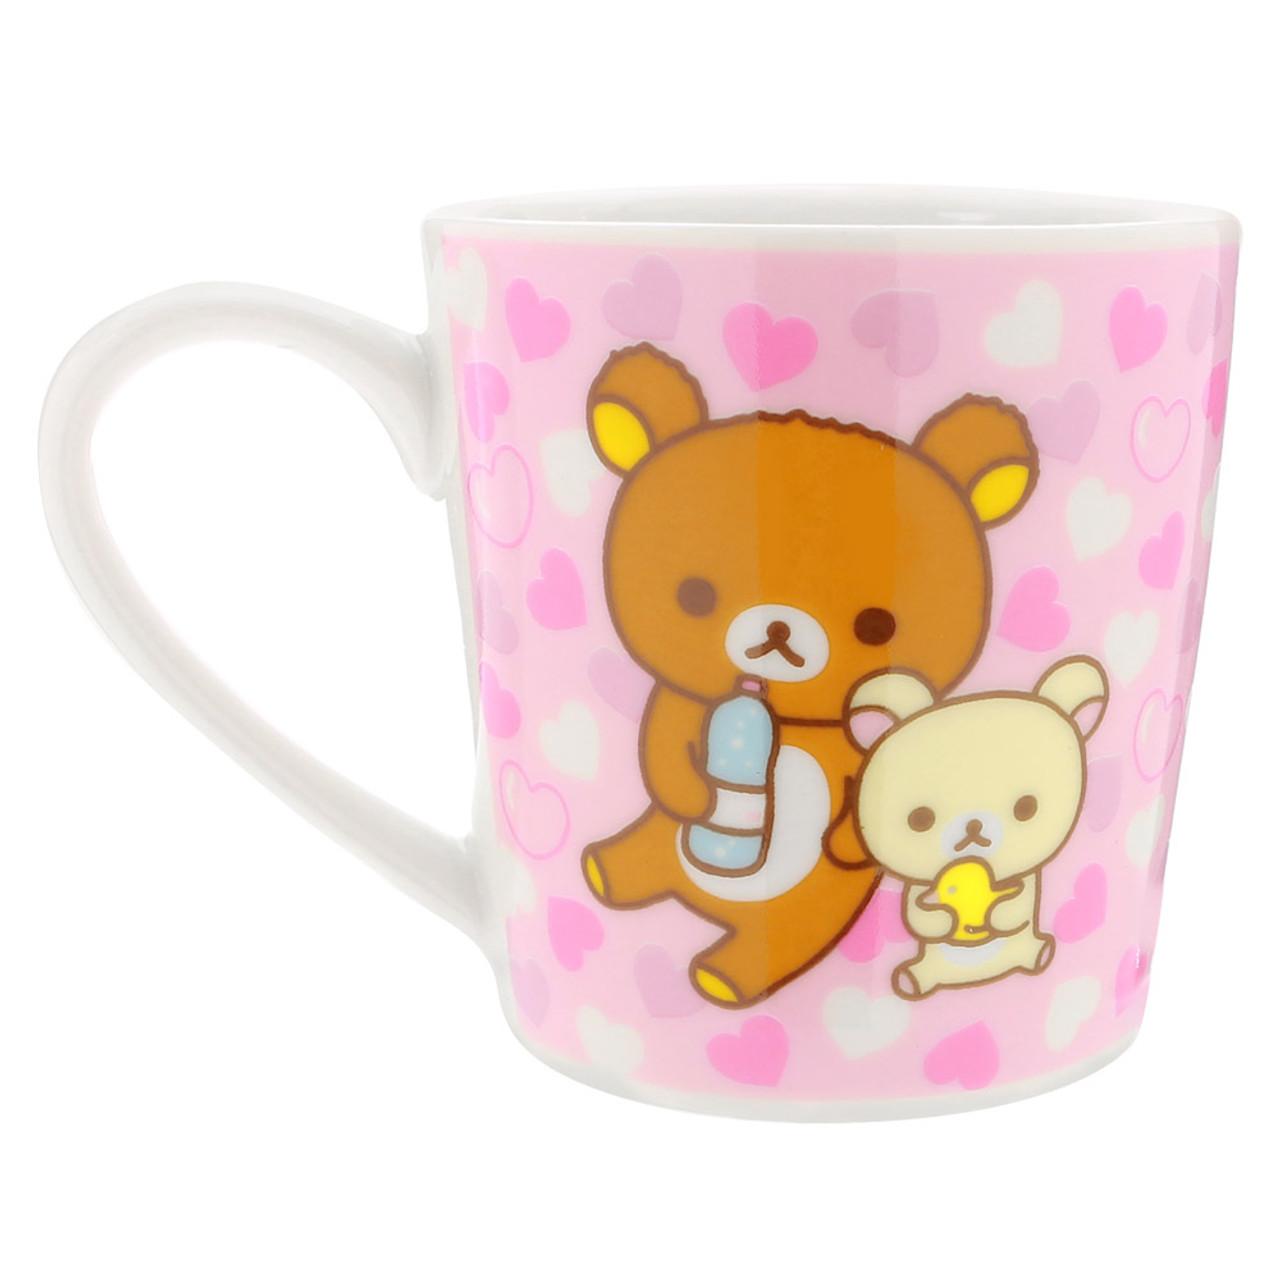 San-x Rilakkuma Bath Time Light Pink Ceramic Mug - Heart ( Back View )